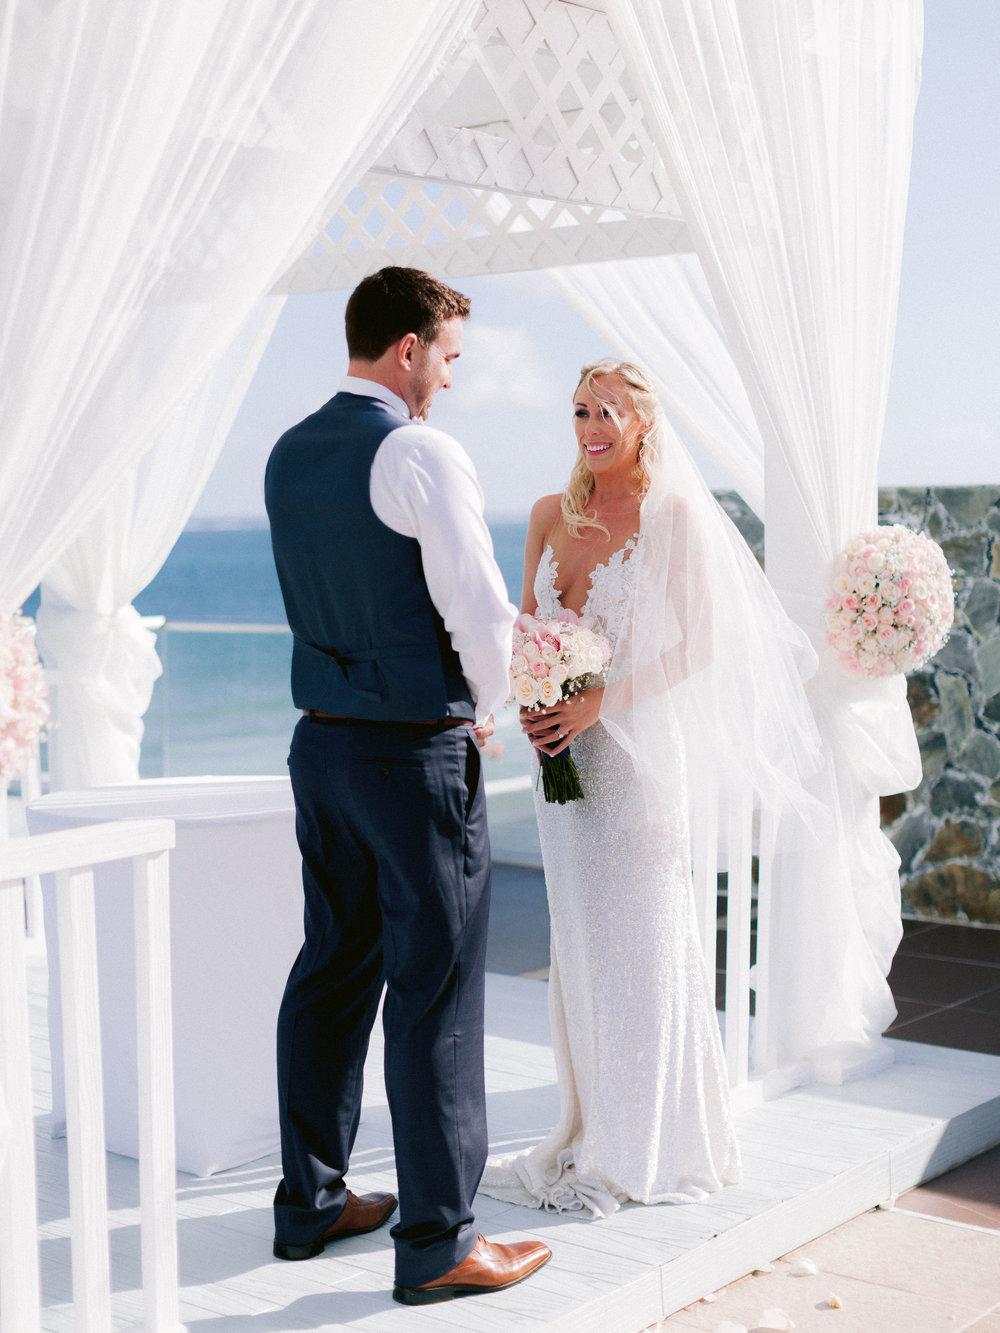 Kim_Jeff_Cancun Wedding_Ceremony_Kurtz_Orpia (65 of 119).jpg